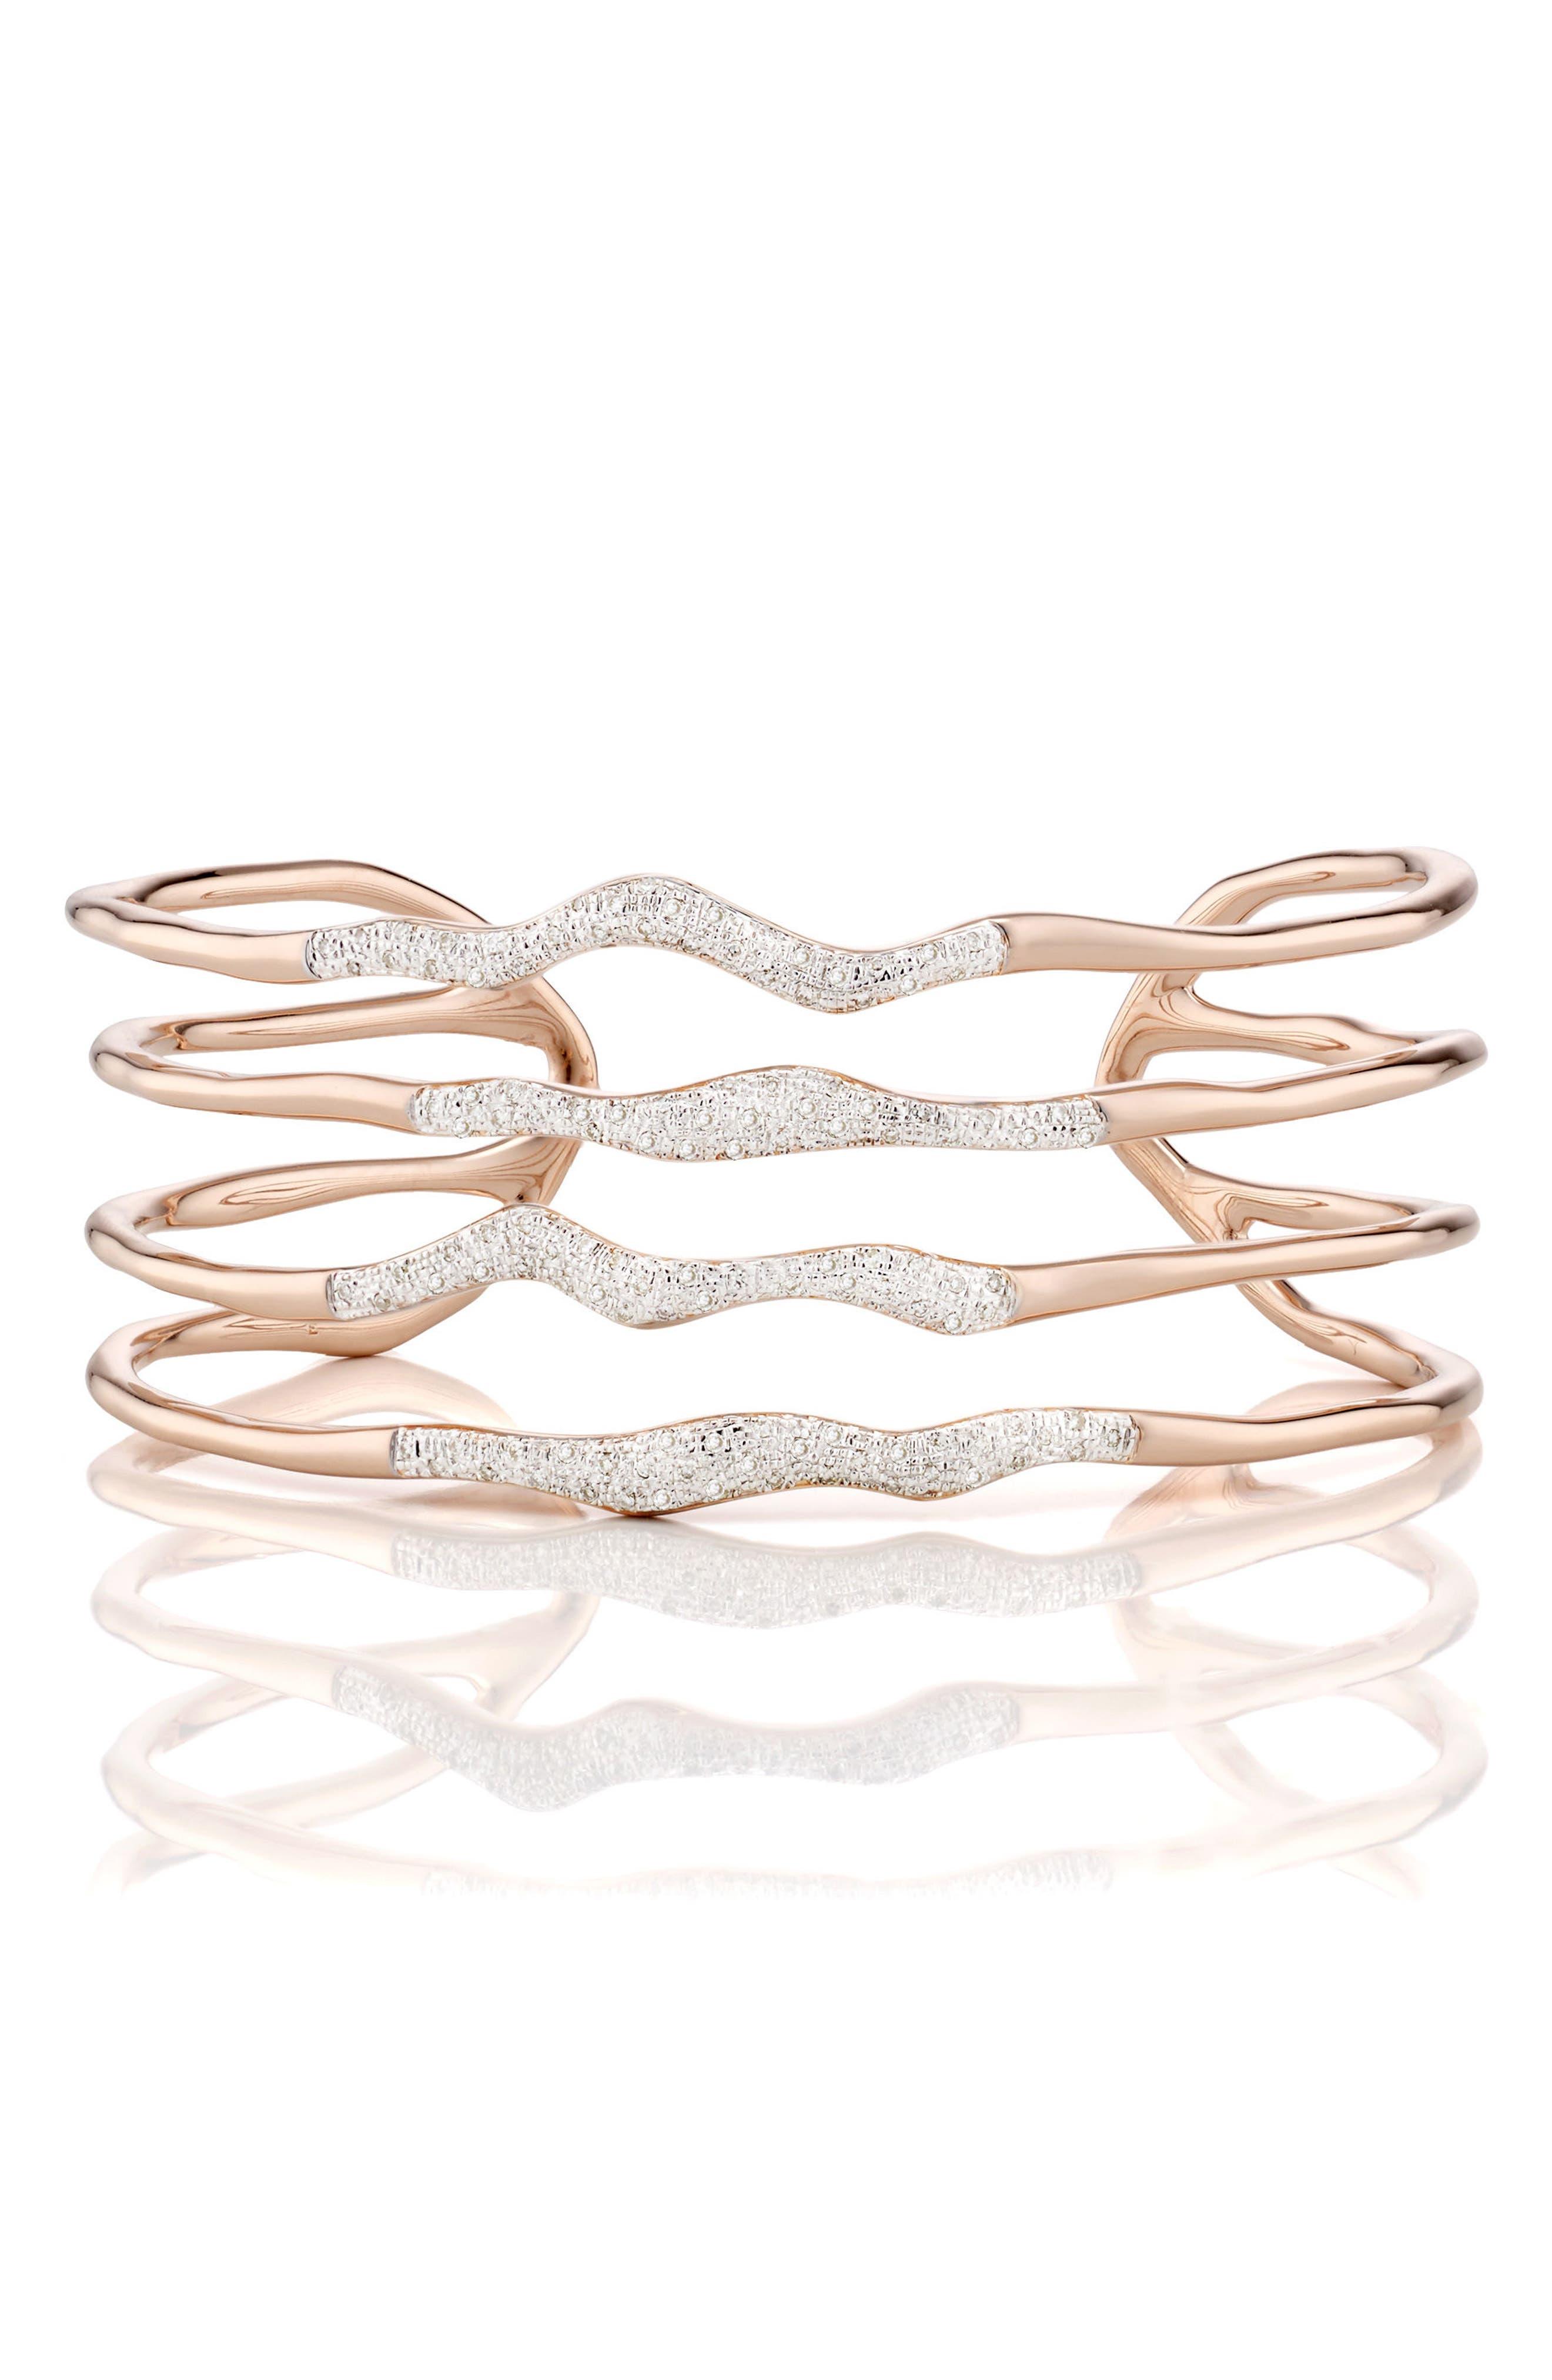 Riva Diamond Hero Wave Cuff Bracelet,                             Main thumbnail 1, color,                             ROSE GOLD/ DIAMOND